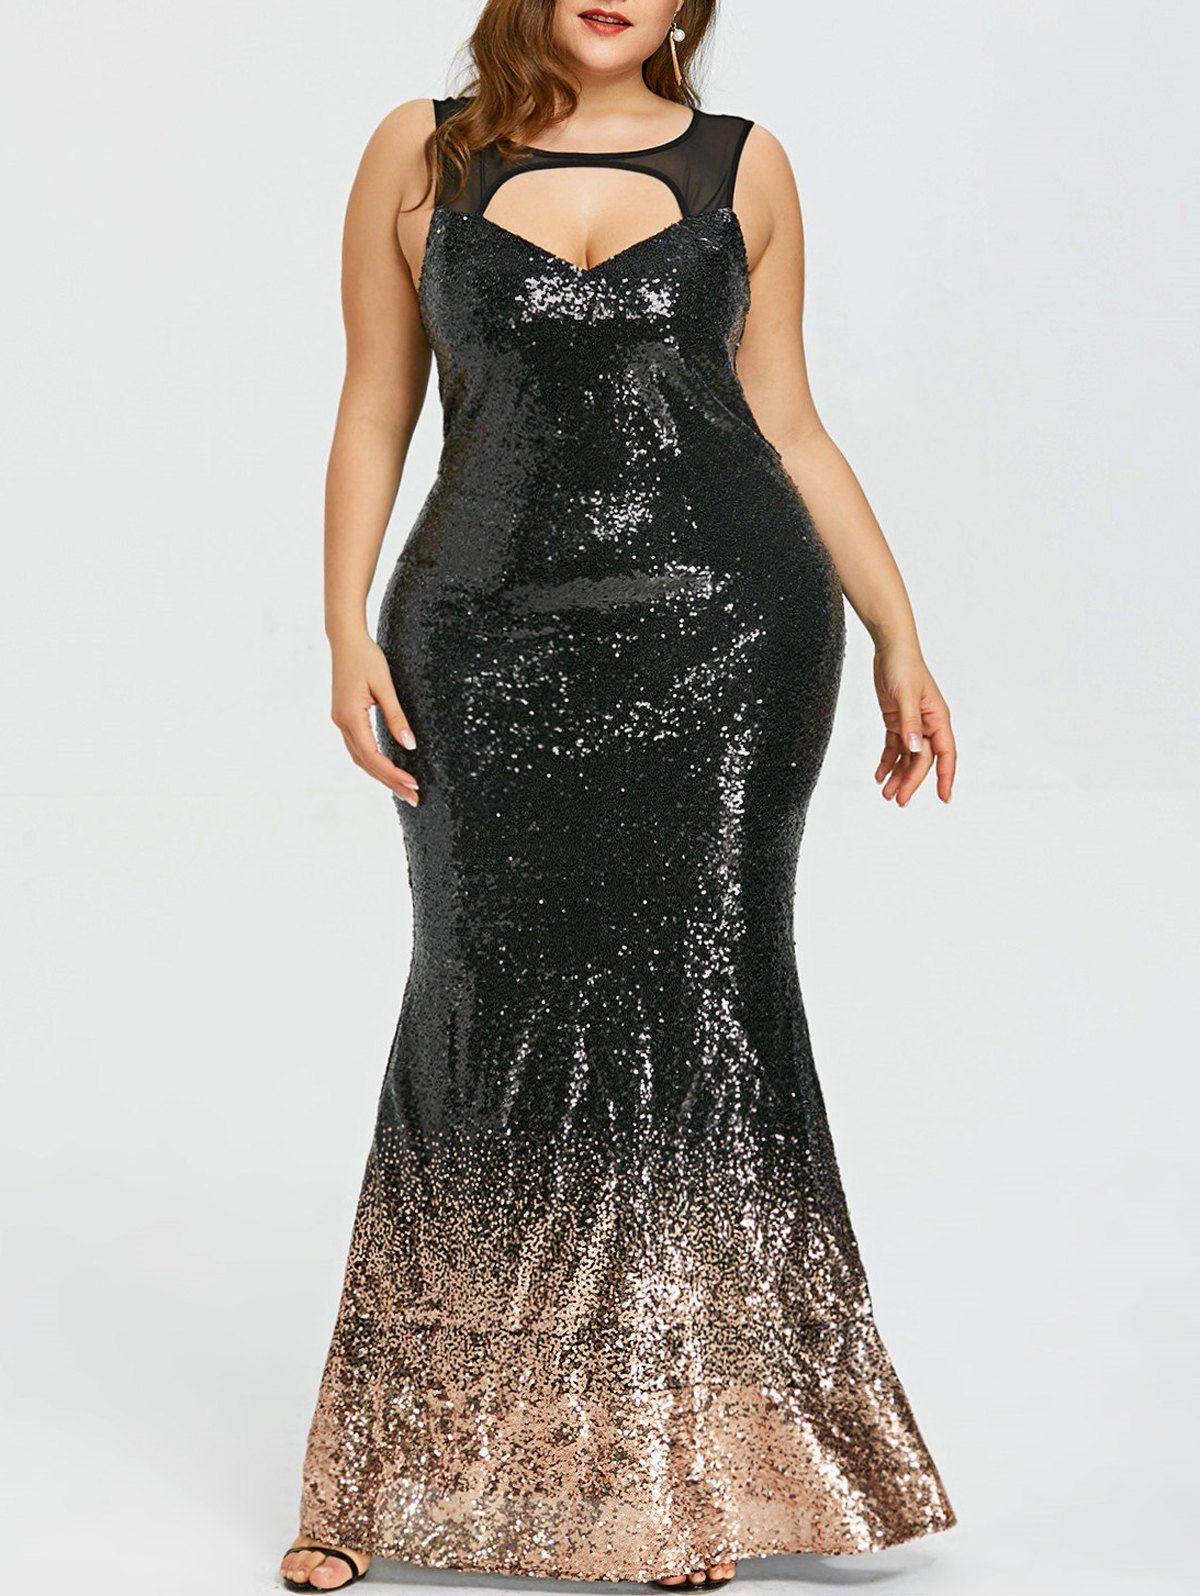 Plus Size Open Back Sparkly Prom Dress Dresses Prom Dresses